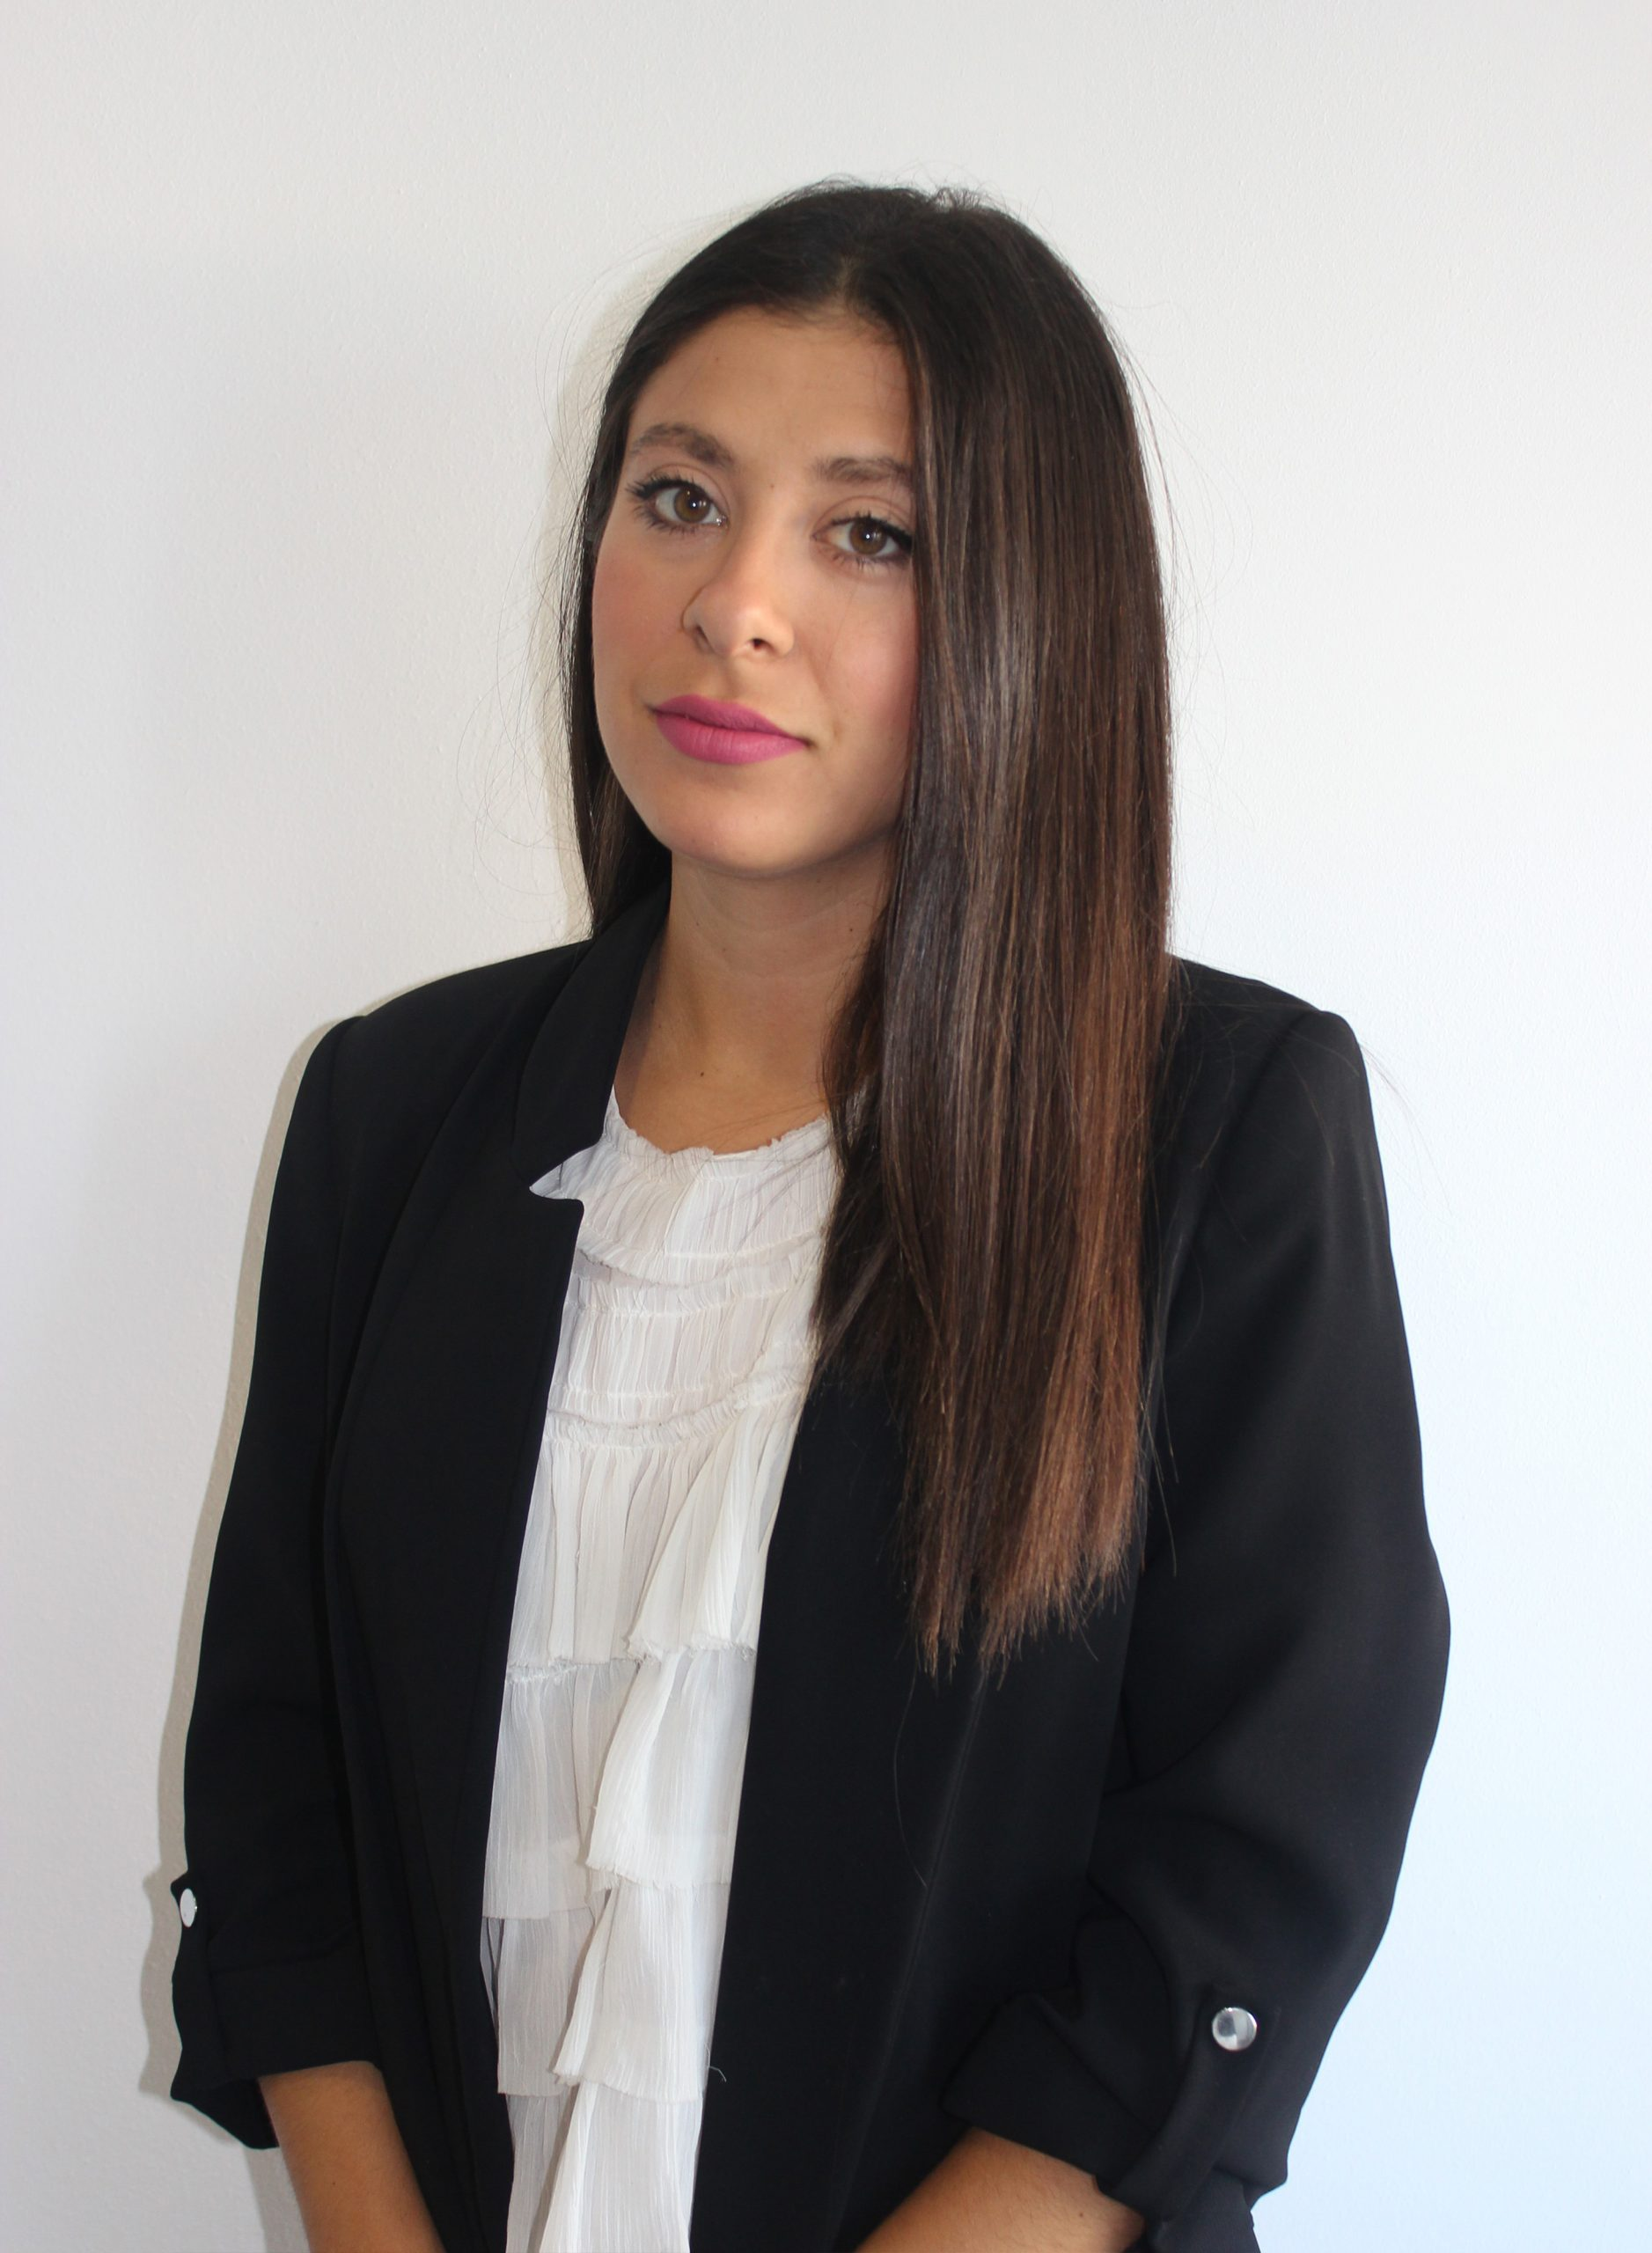 Vanessa Meroño